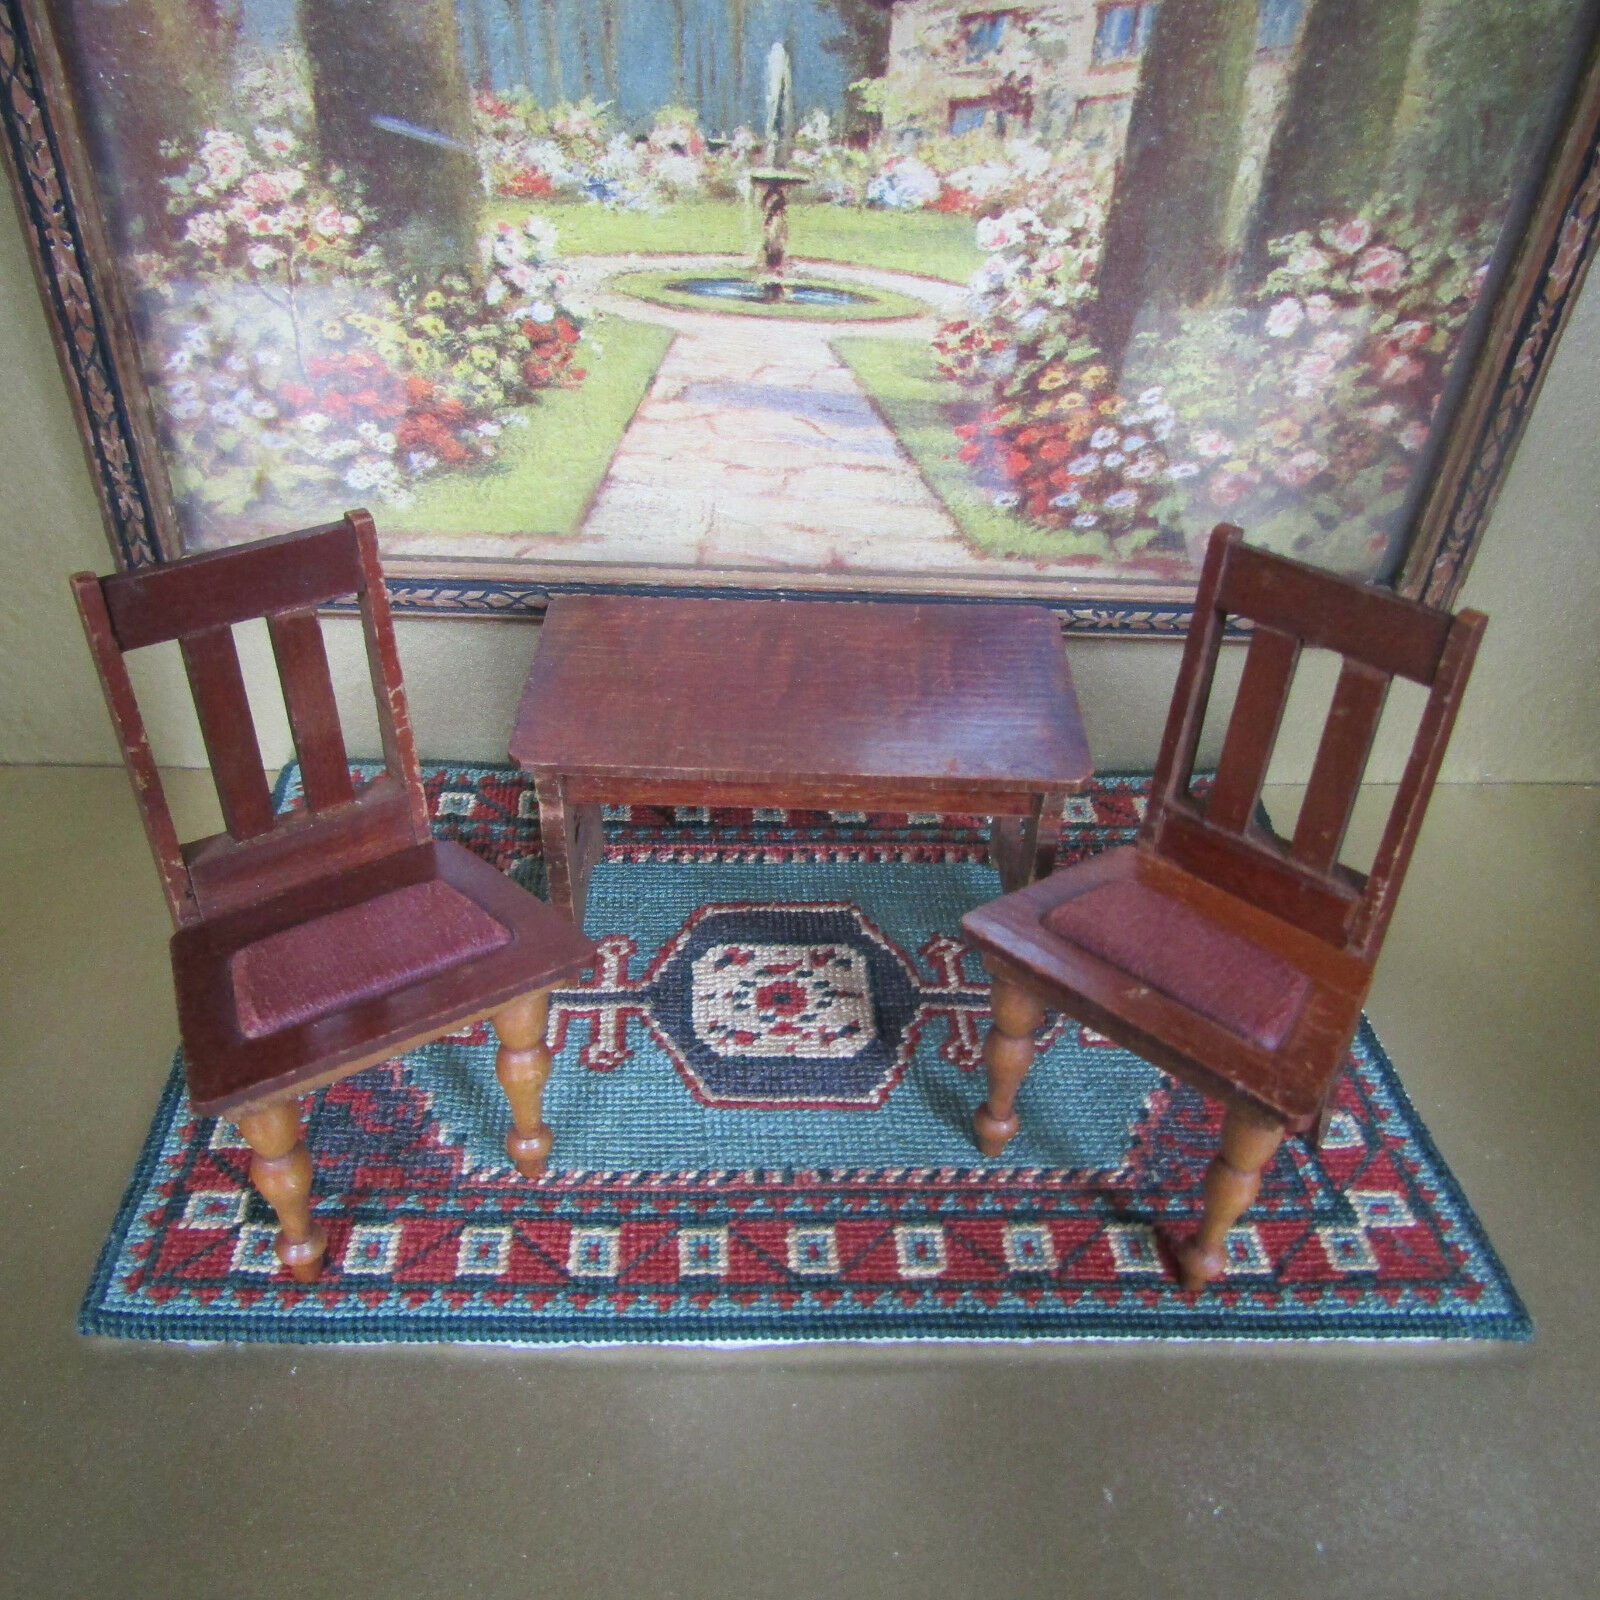 Antique Dollhouse SCHNEEGAS CHAIR TABLE 1800s Victorian Miniature Wood Furniture